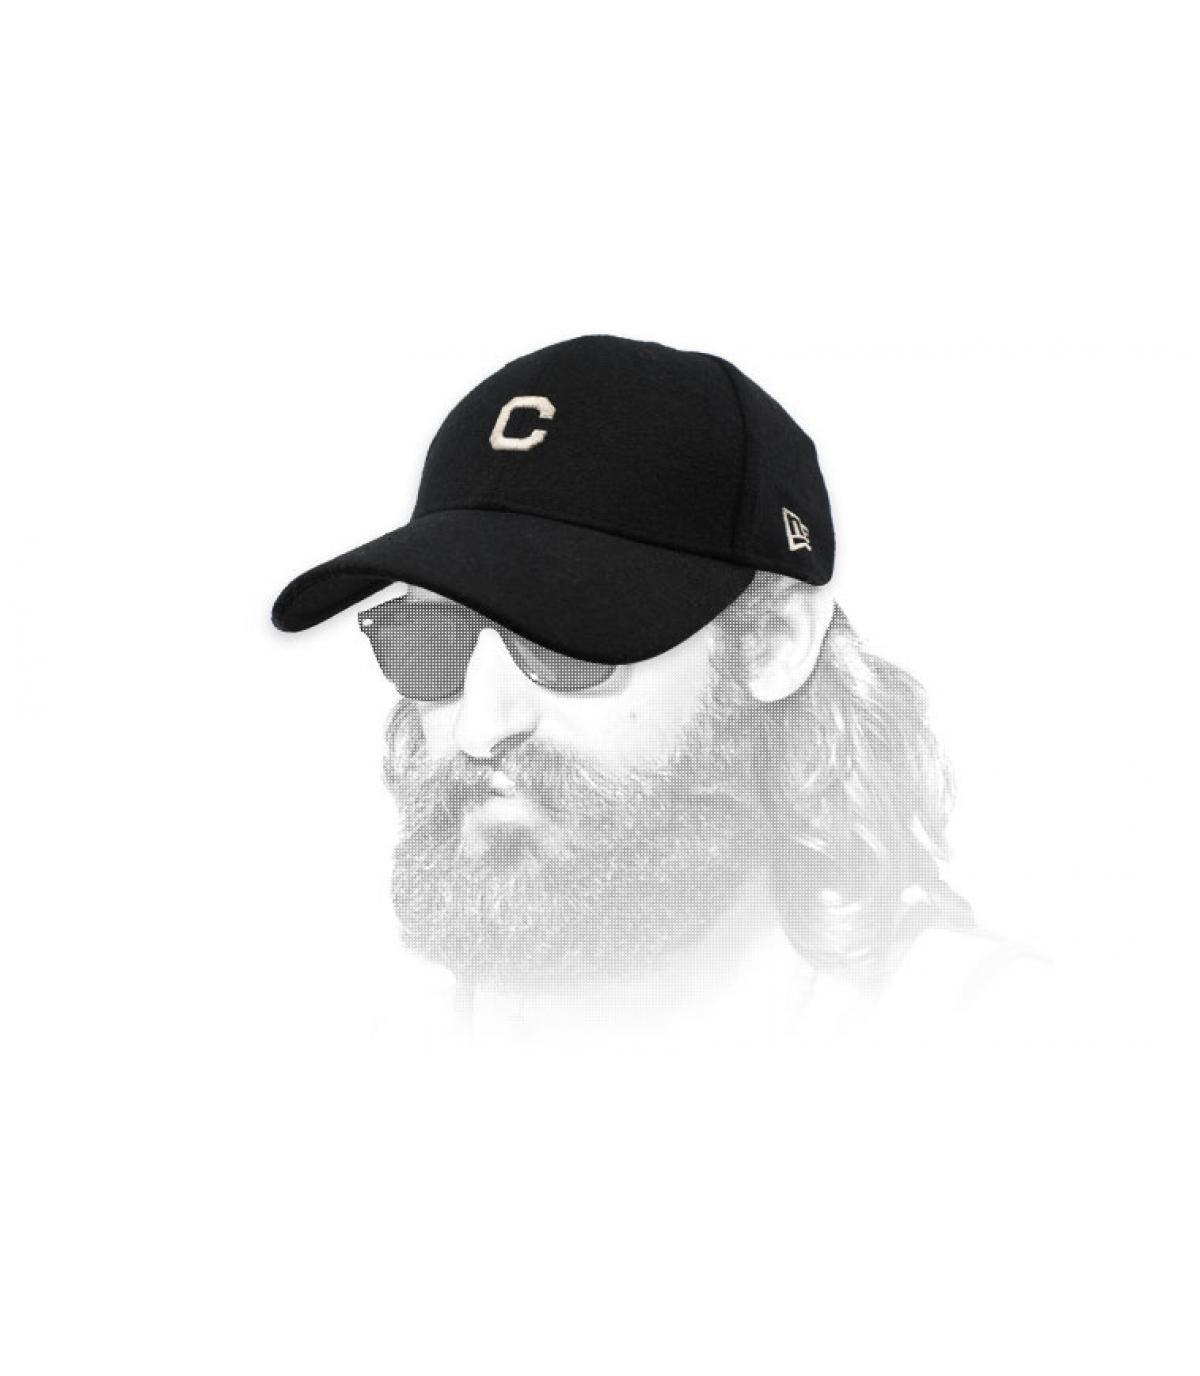 Cap C noir